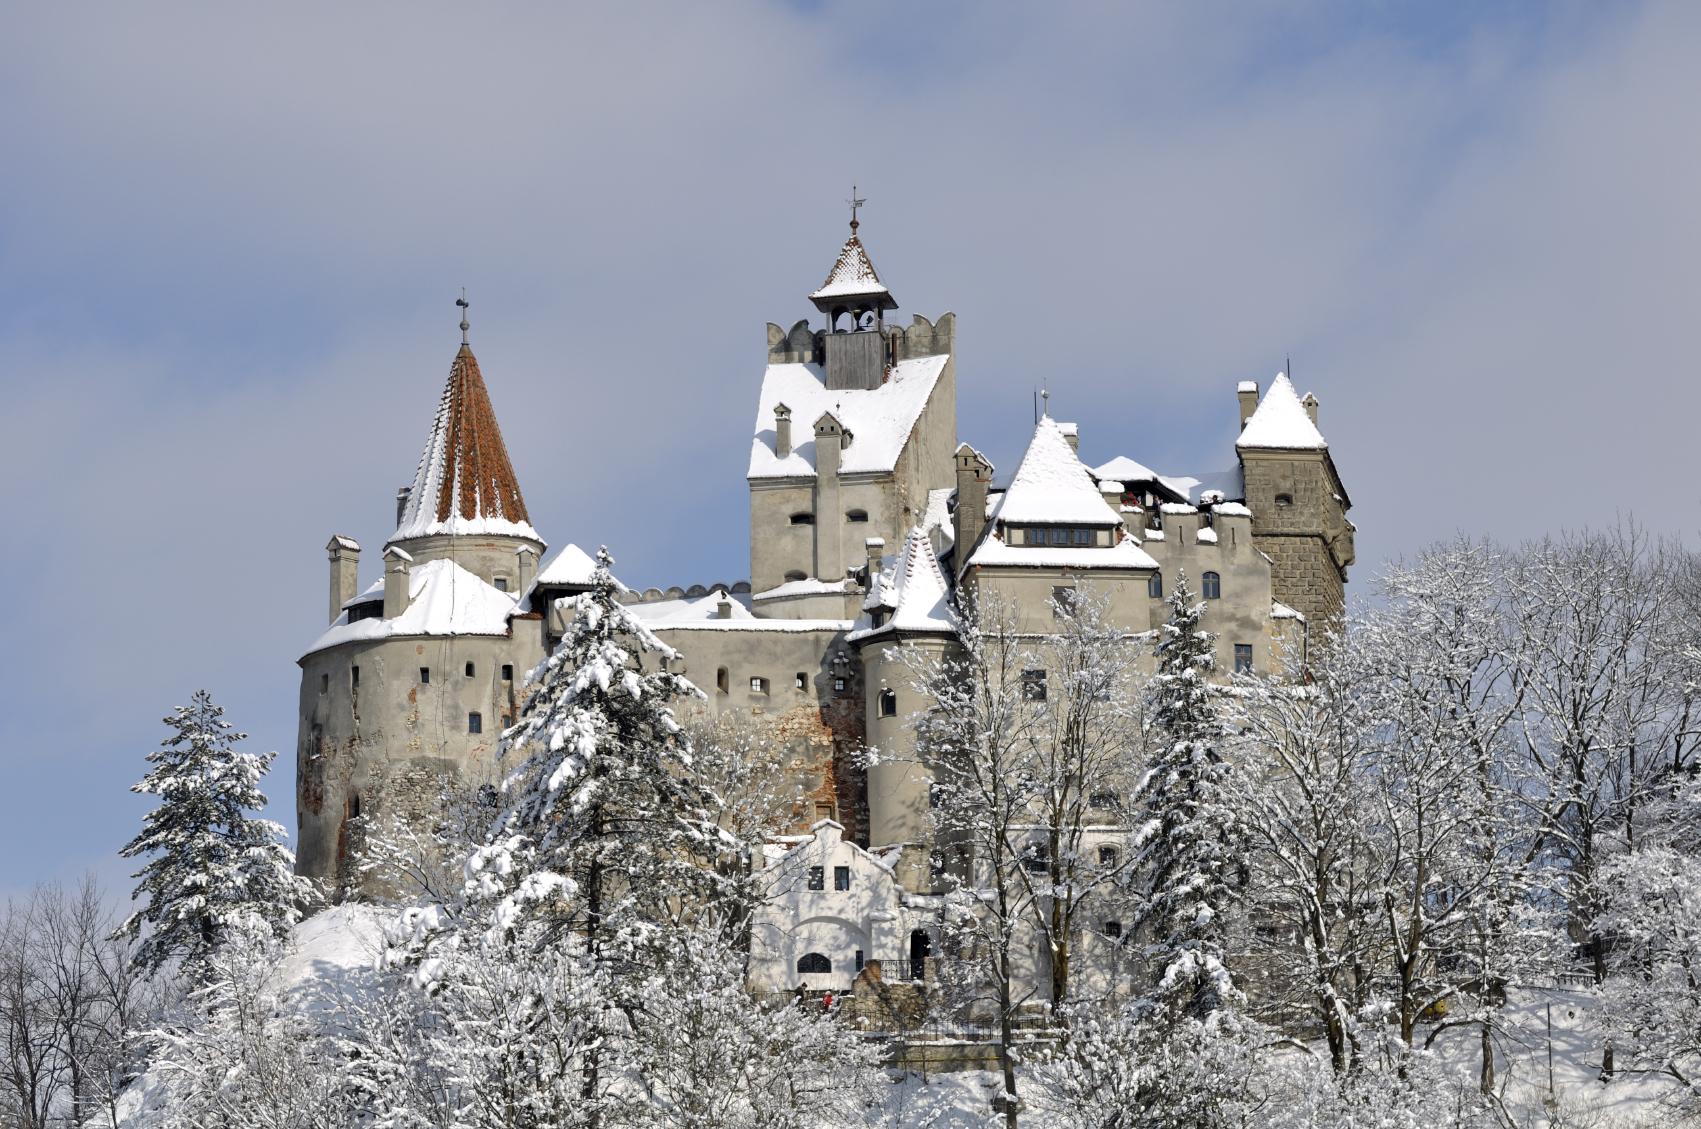 File:Castelul-bran-iarna.jpg - Wikimedia Commons